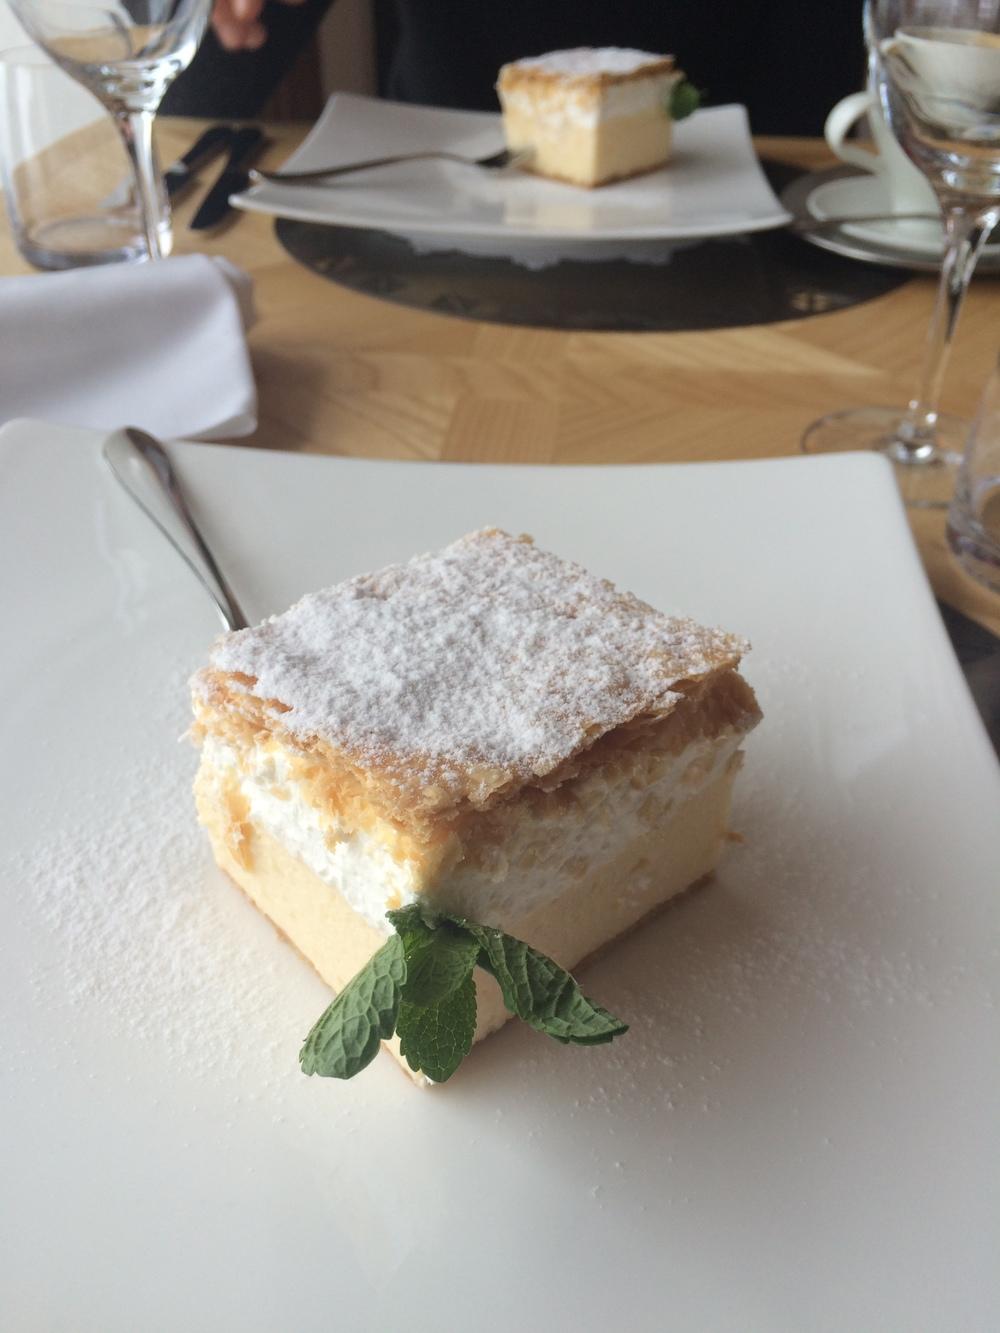 Original Bled Cream Cake at the Lake Bled Restaurant.